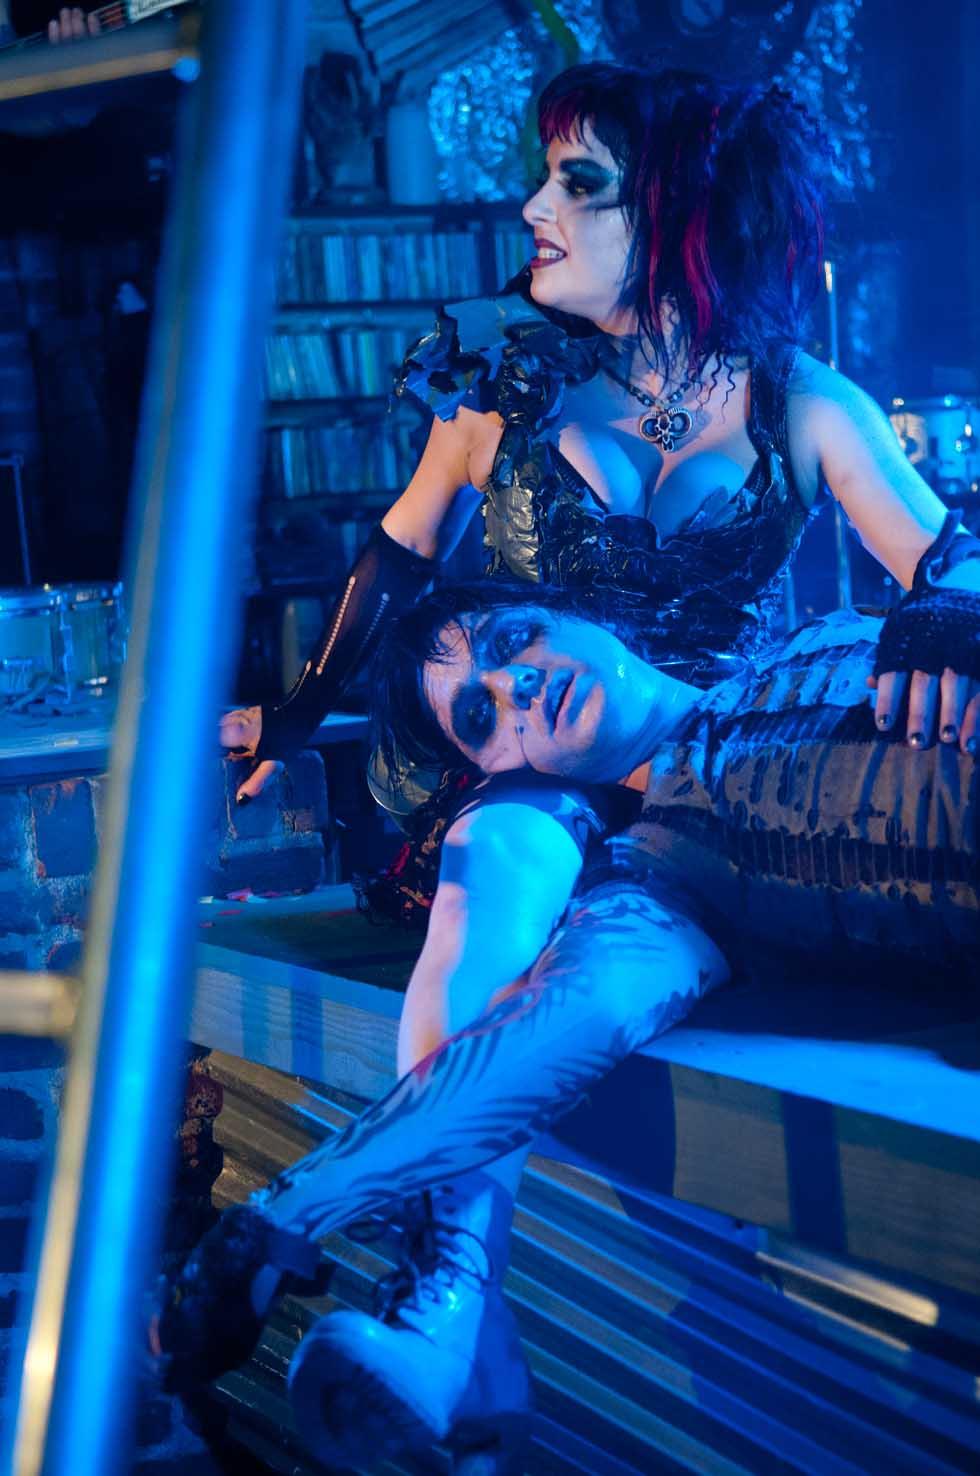 zum-schneider-nyc-2012-karneval-apocalyptika-3836.jpg